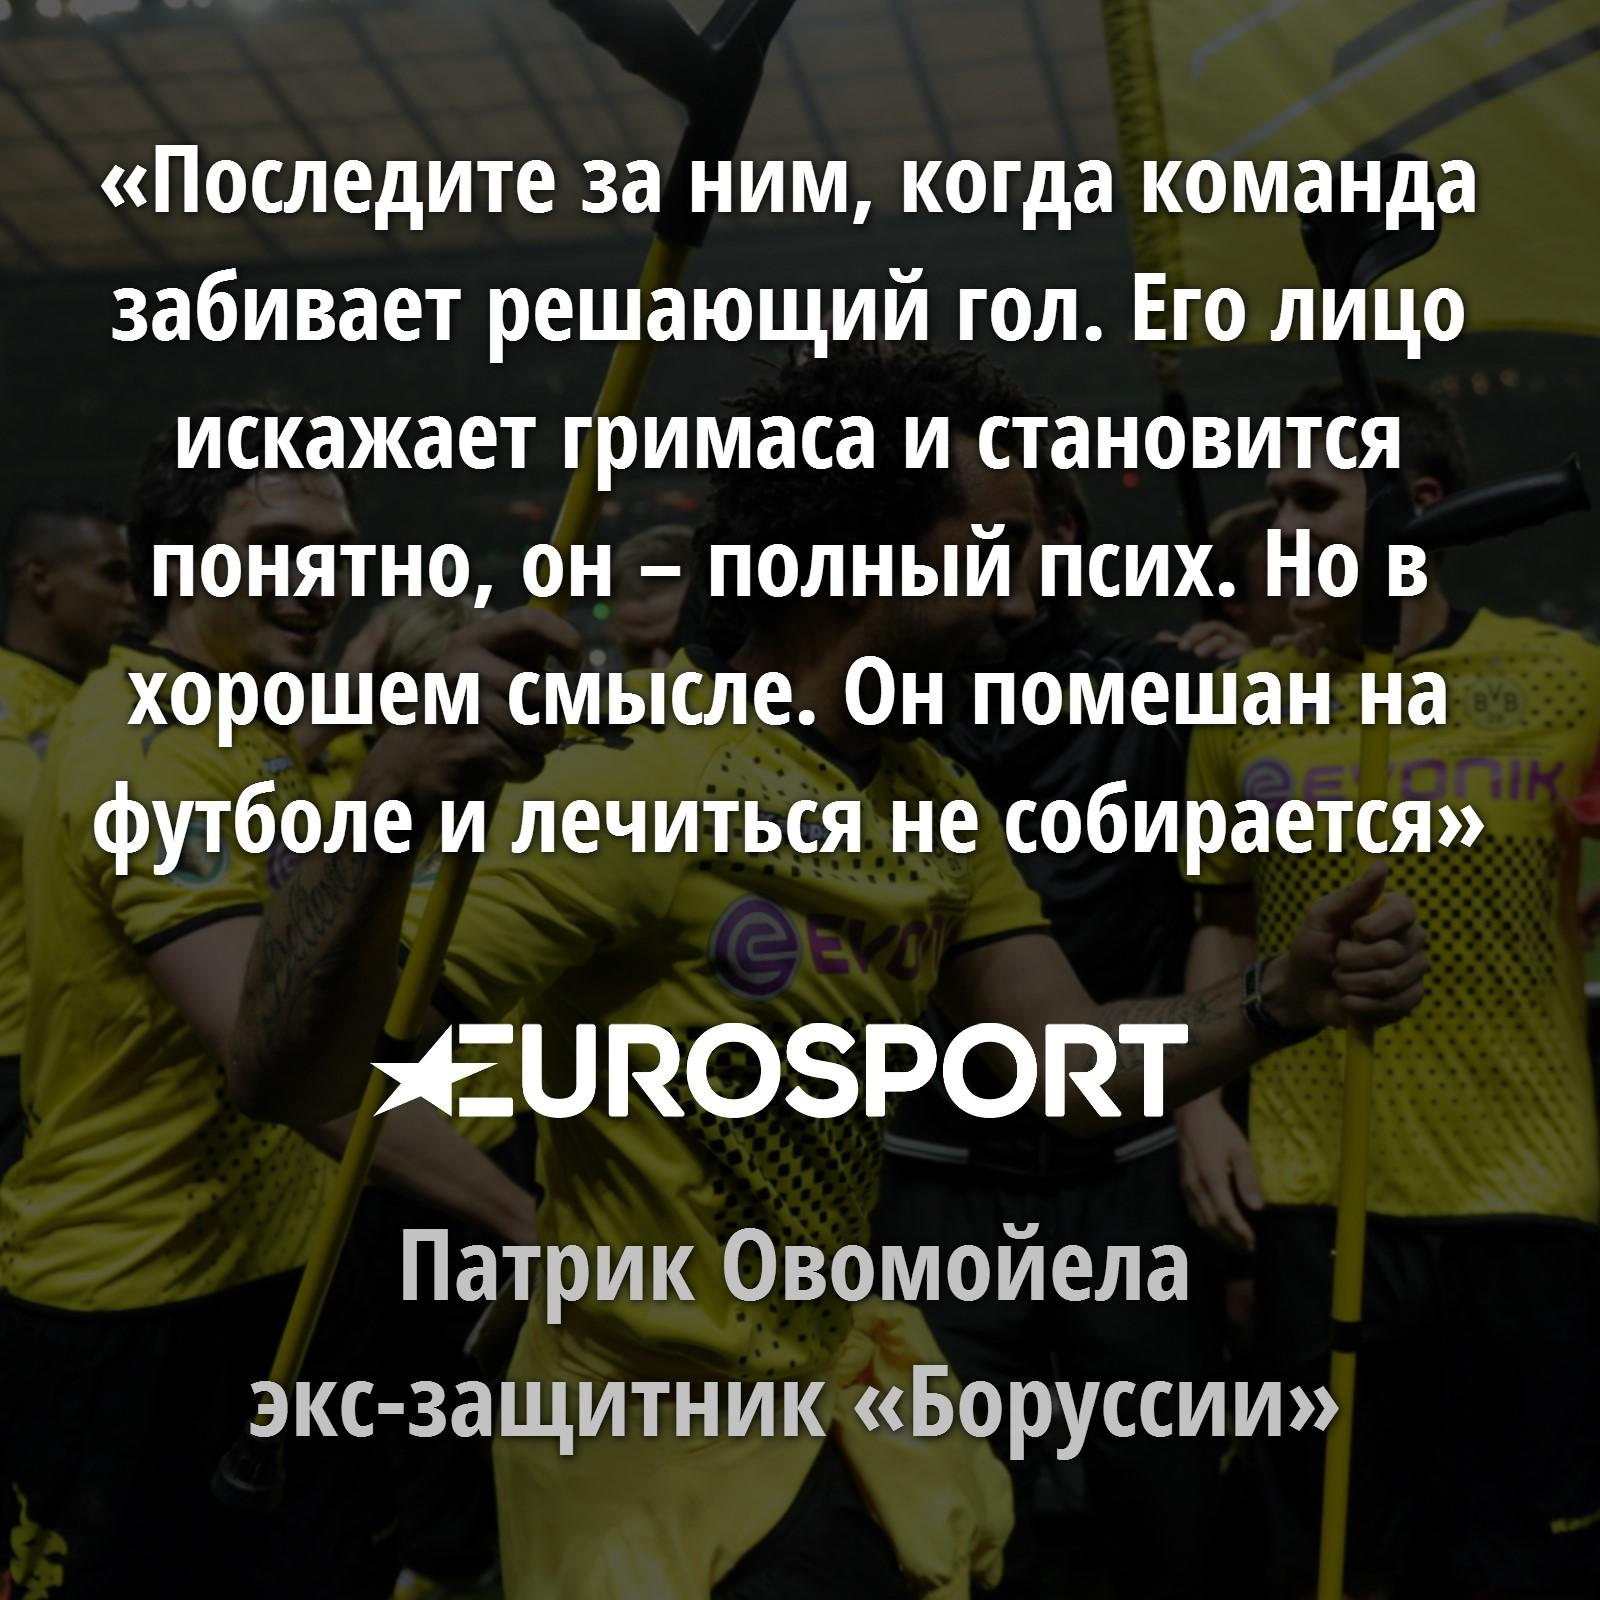 https://i.eurosport.com/2015/11/19/1735224.jpg